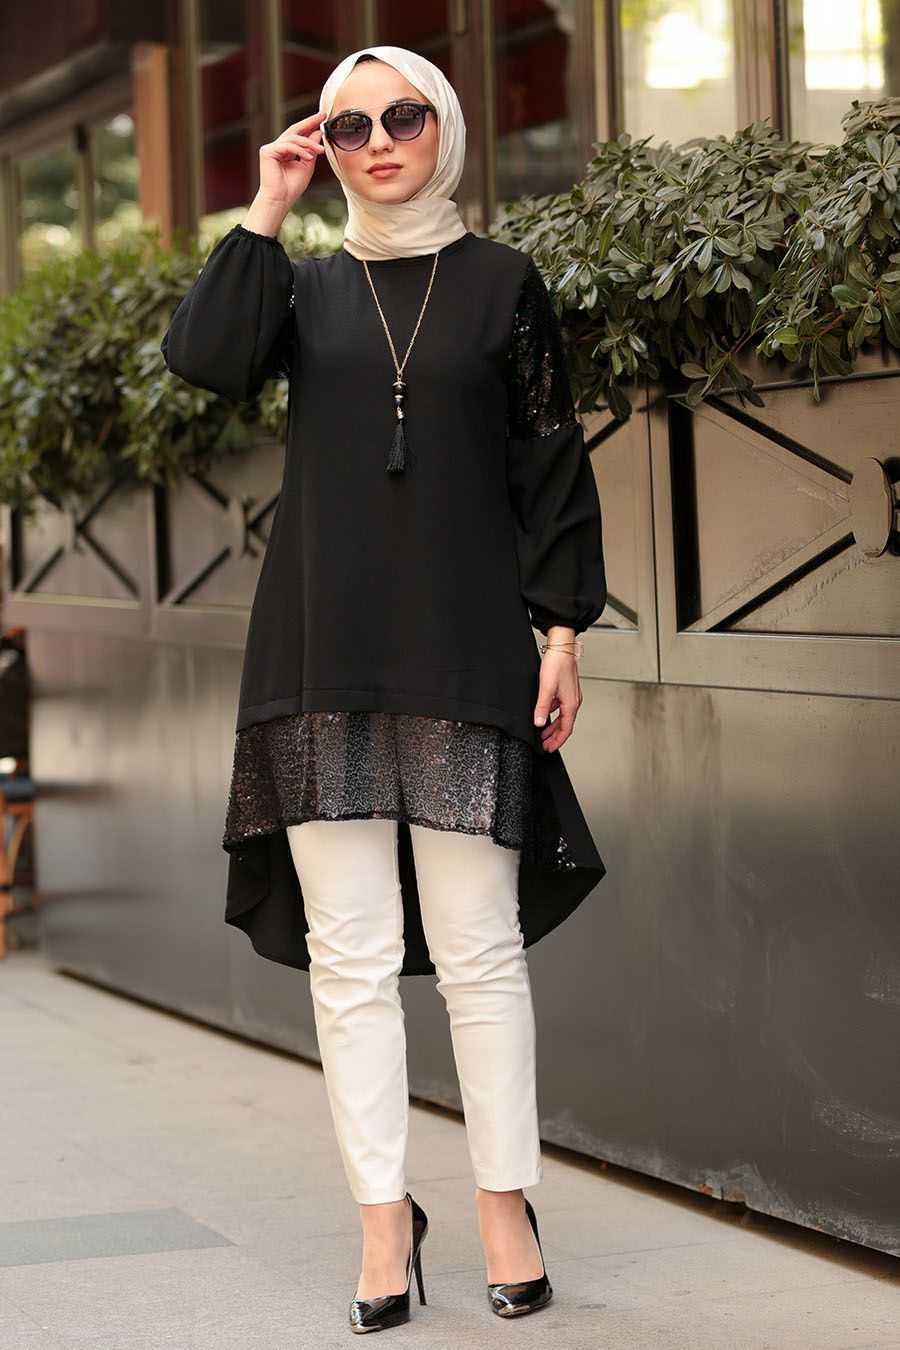 Nayla Collection Pul Payetli Siyah Tunik Modelleri